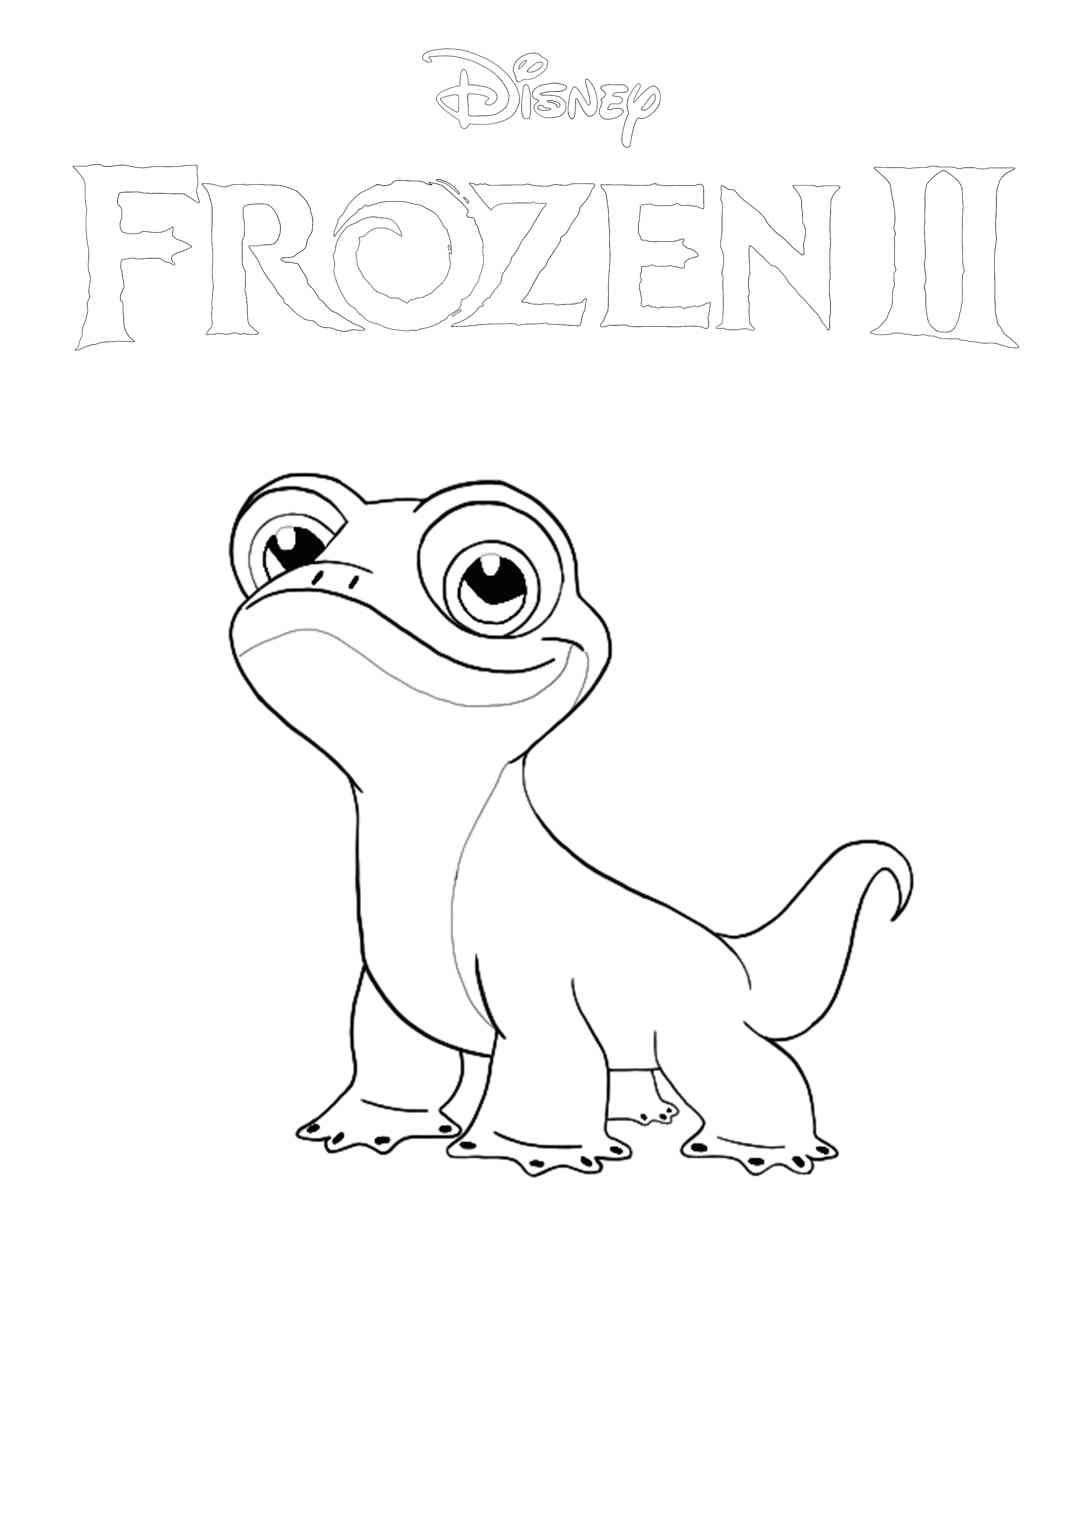 Frozen 2 Bruni Coloring Page Disney Coloring Sheets Disney Coloring Pages Frozen Coloring Pages